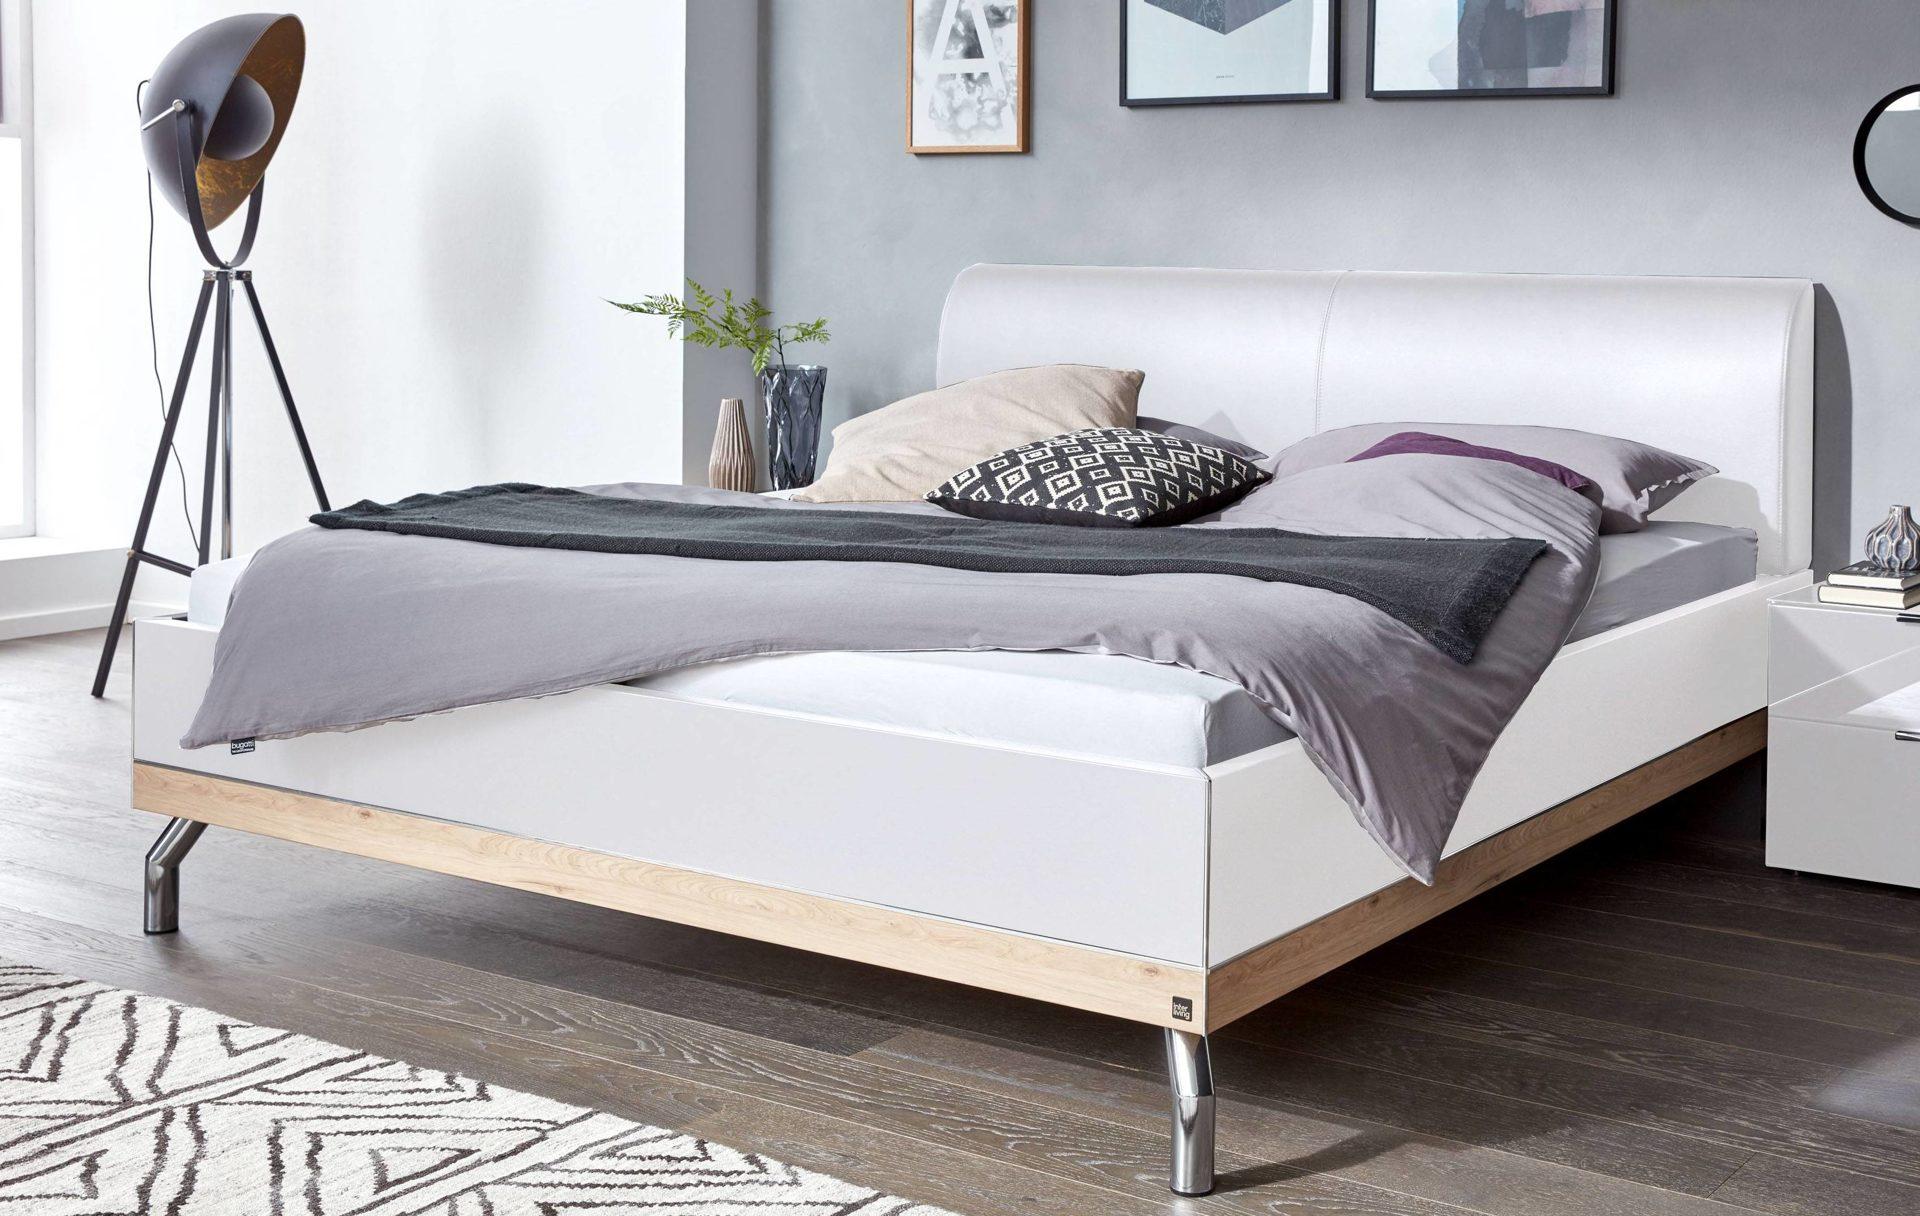 Möbel Bernskötter Gmbh Möbel A Z Betten Doppelbetten